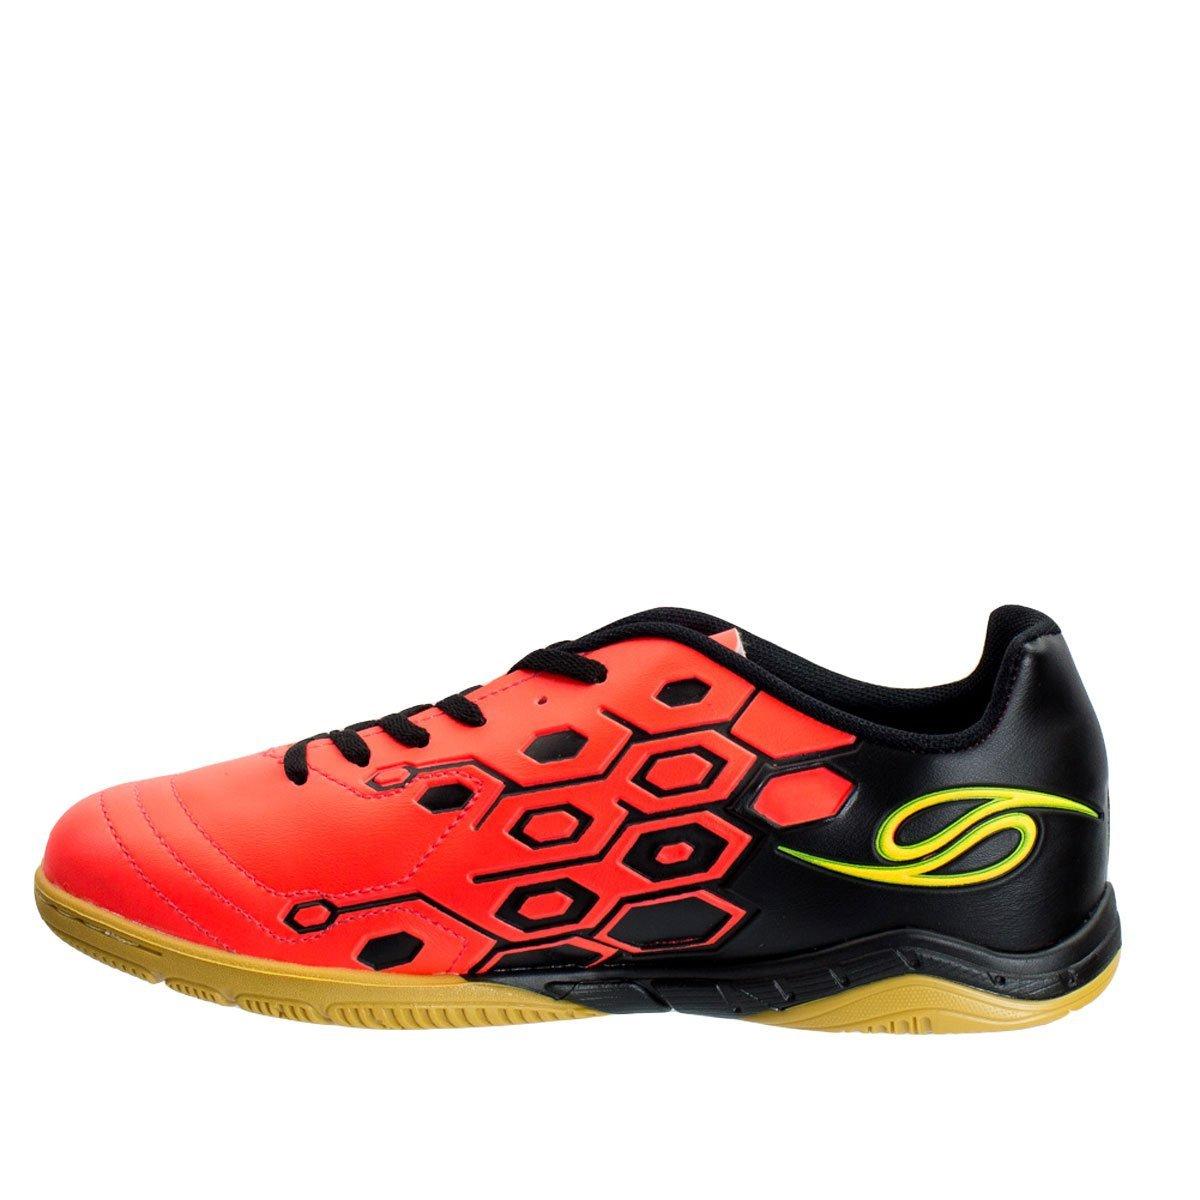 34910def33 Chuteira Futsal Dalponte Cyber Indoor 804741397 - Compre Agora ...